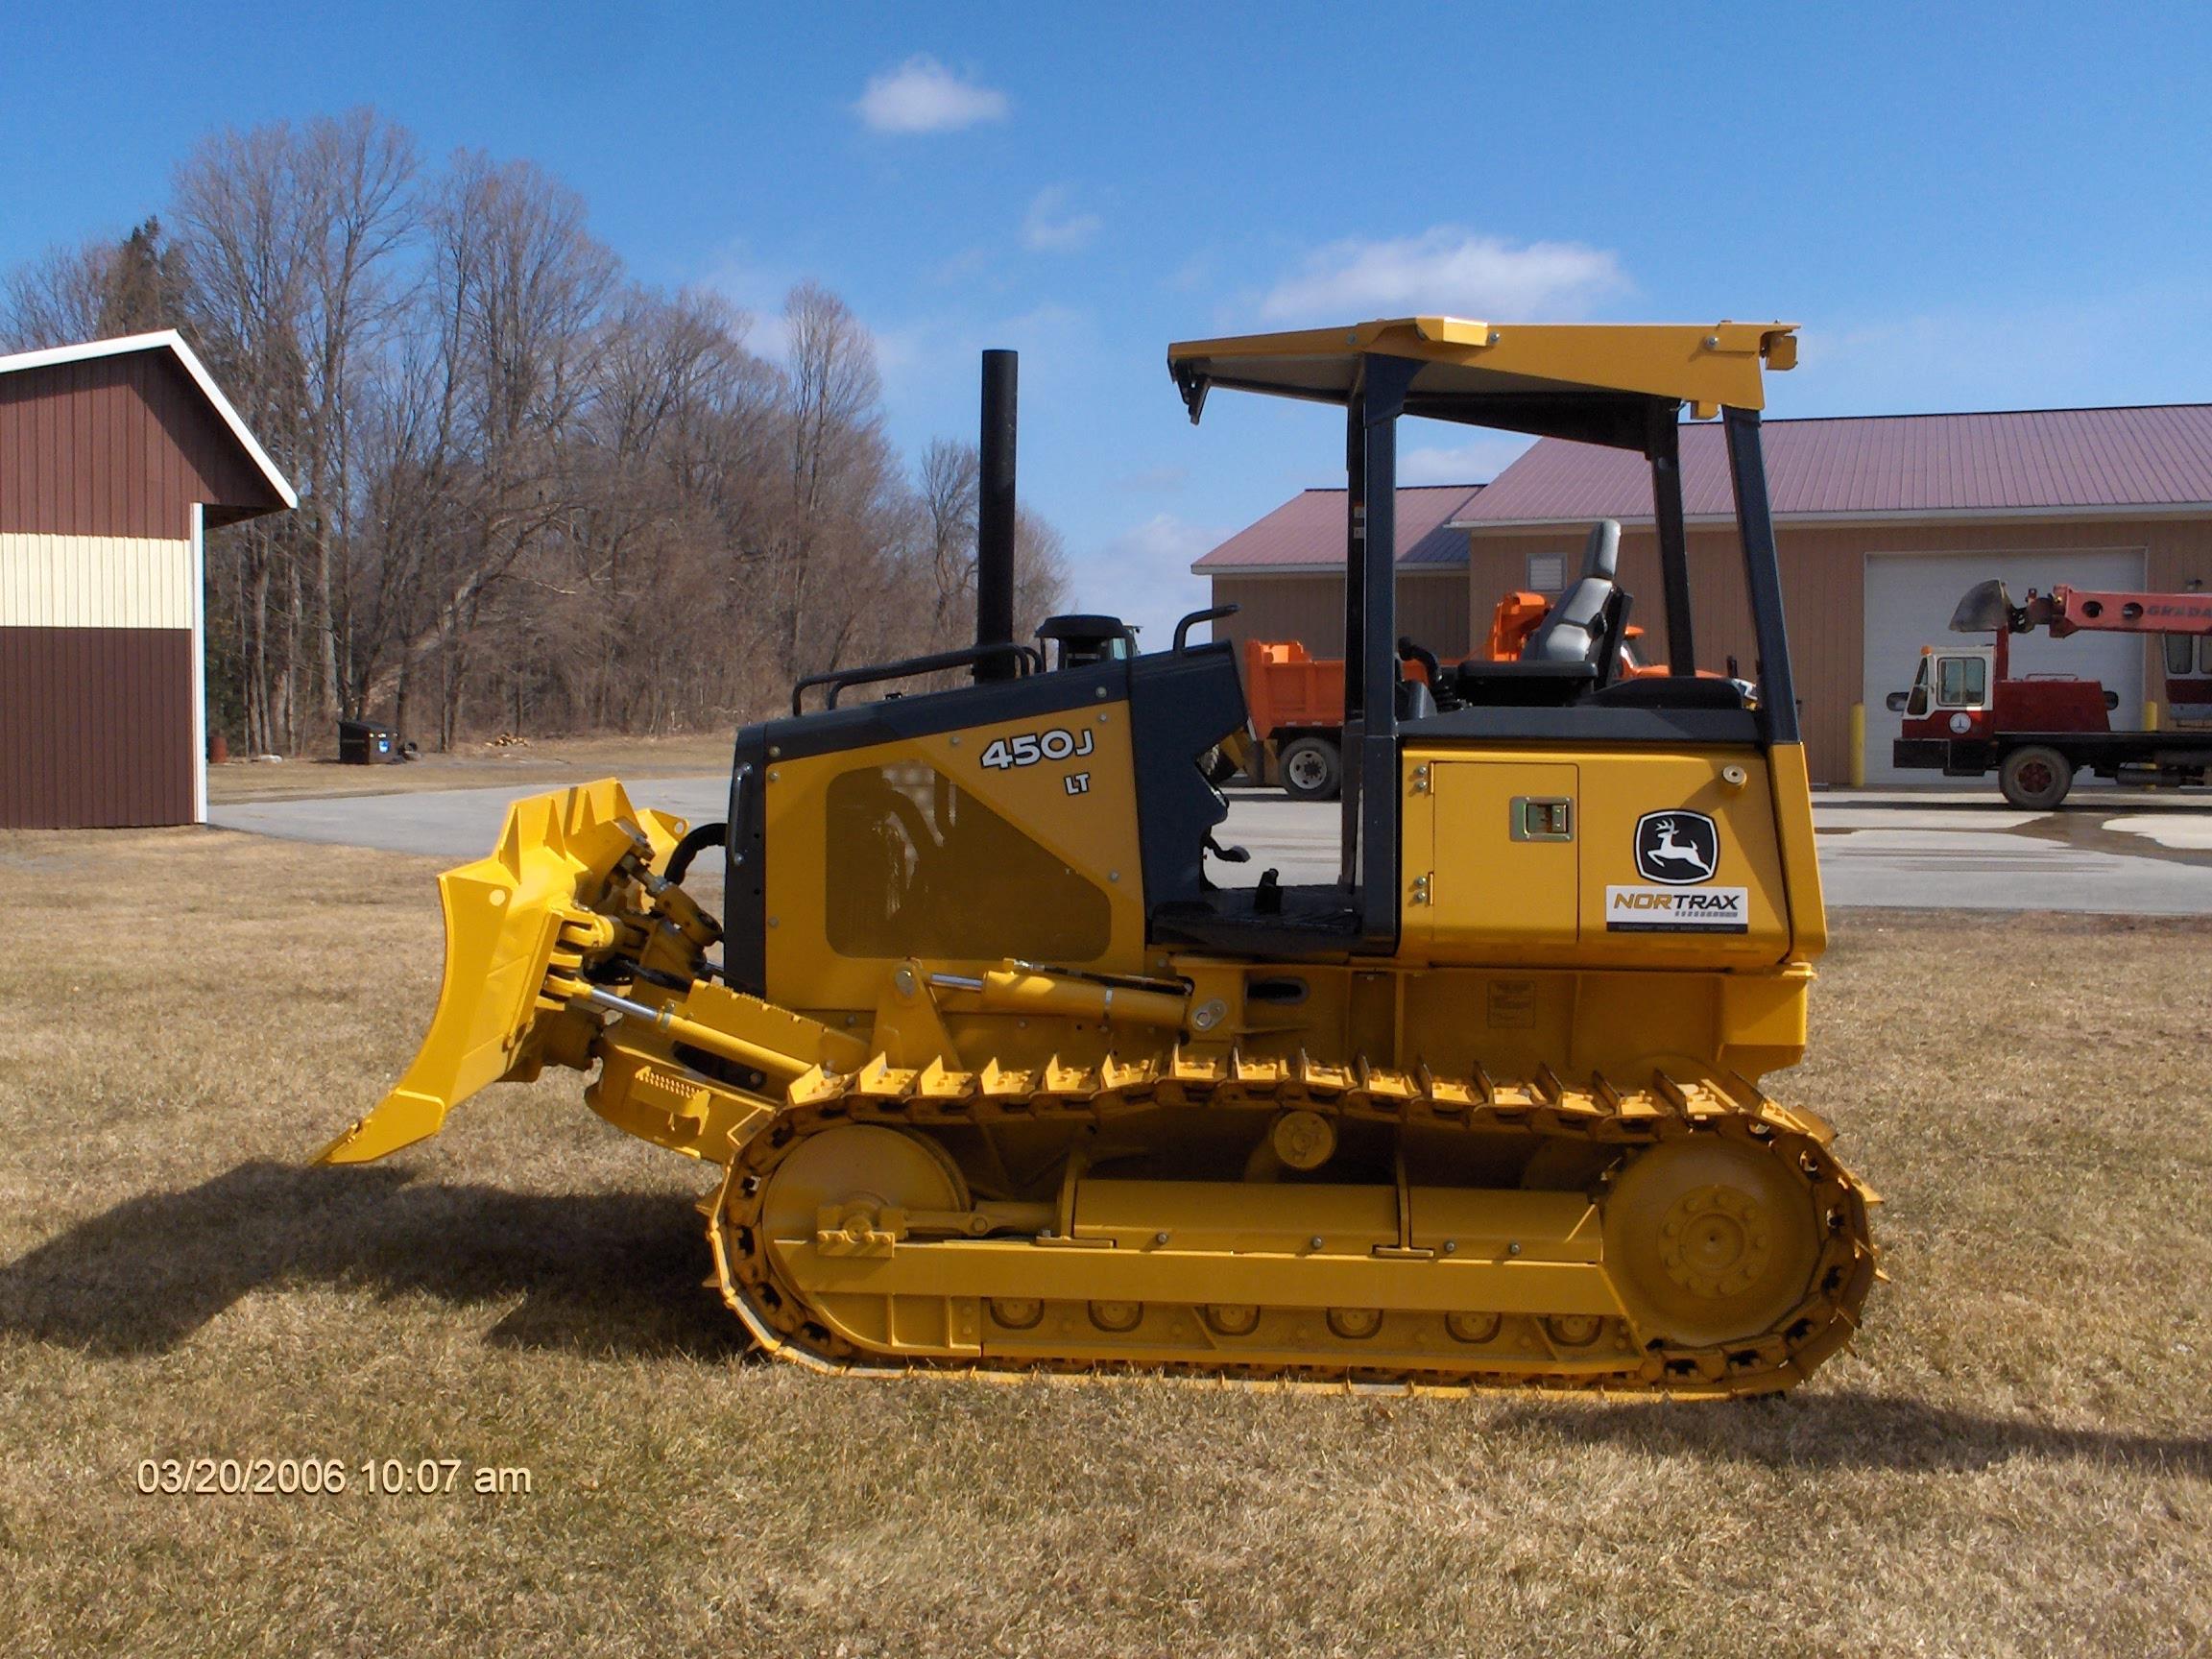 New John Deere 450 J Bulldozer